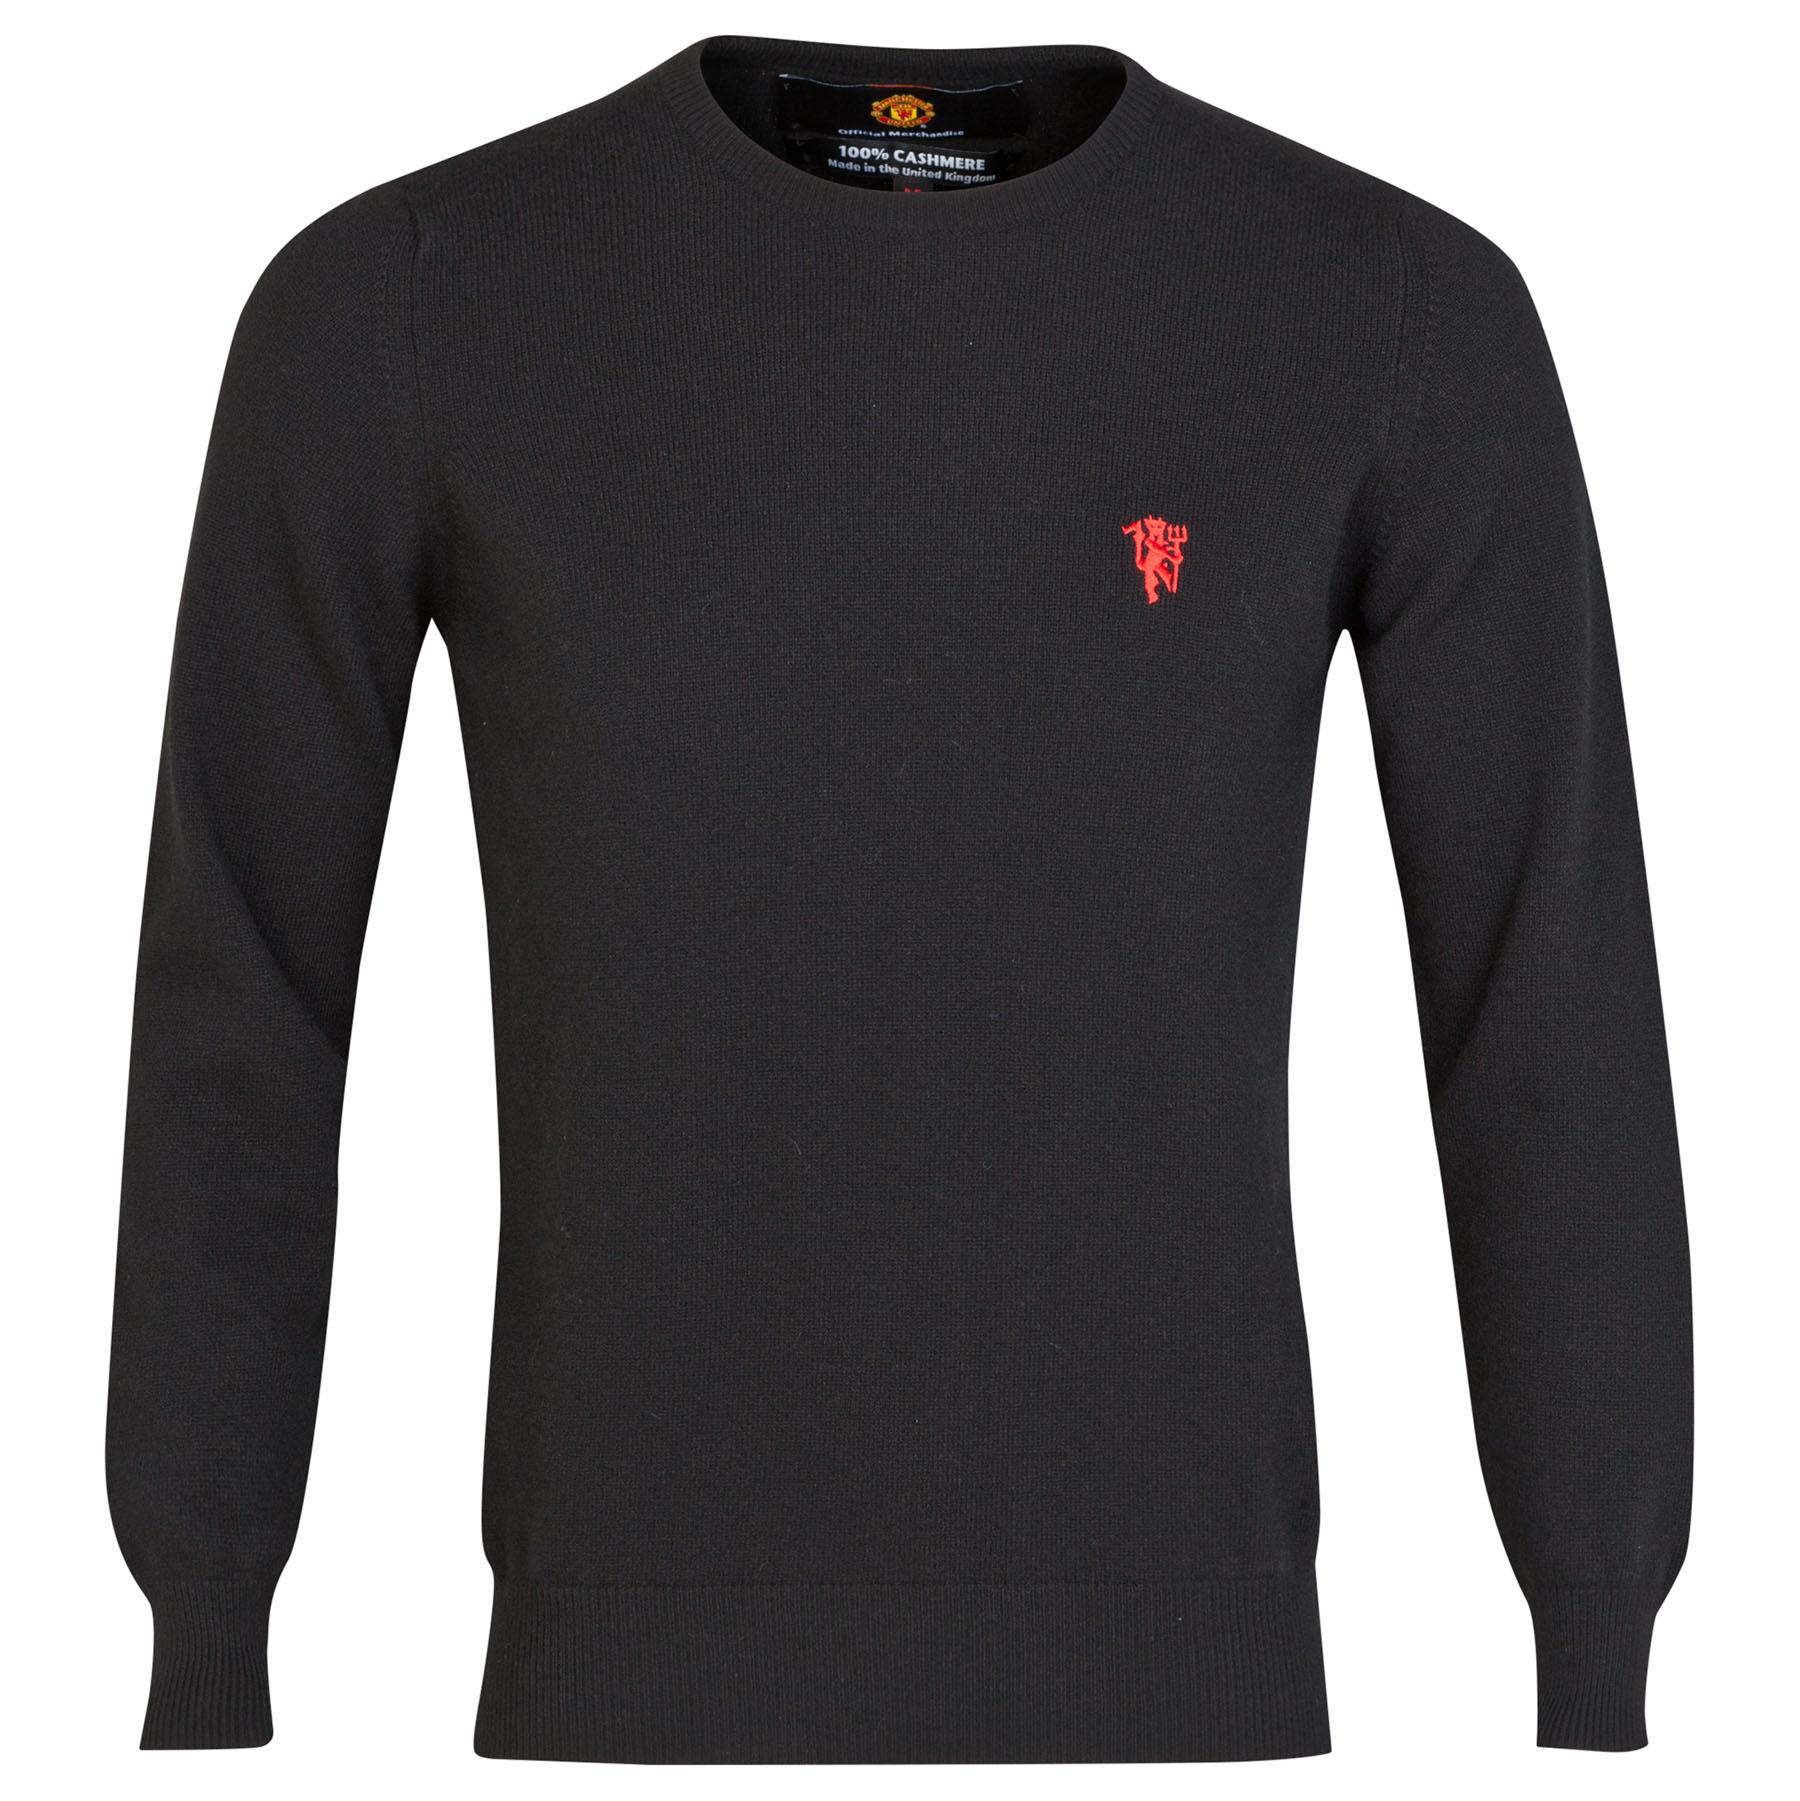 Manchester United Cashmere Crew Neck Sweater - Black - Mens